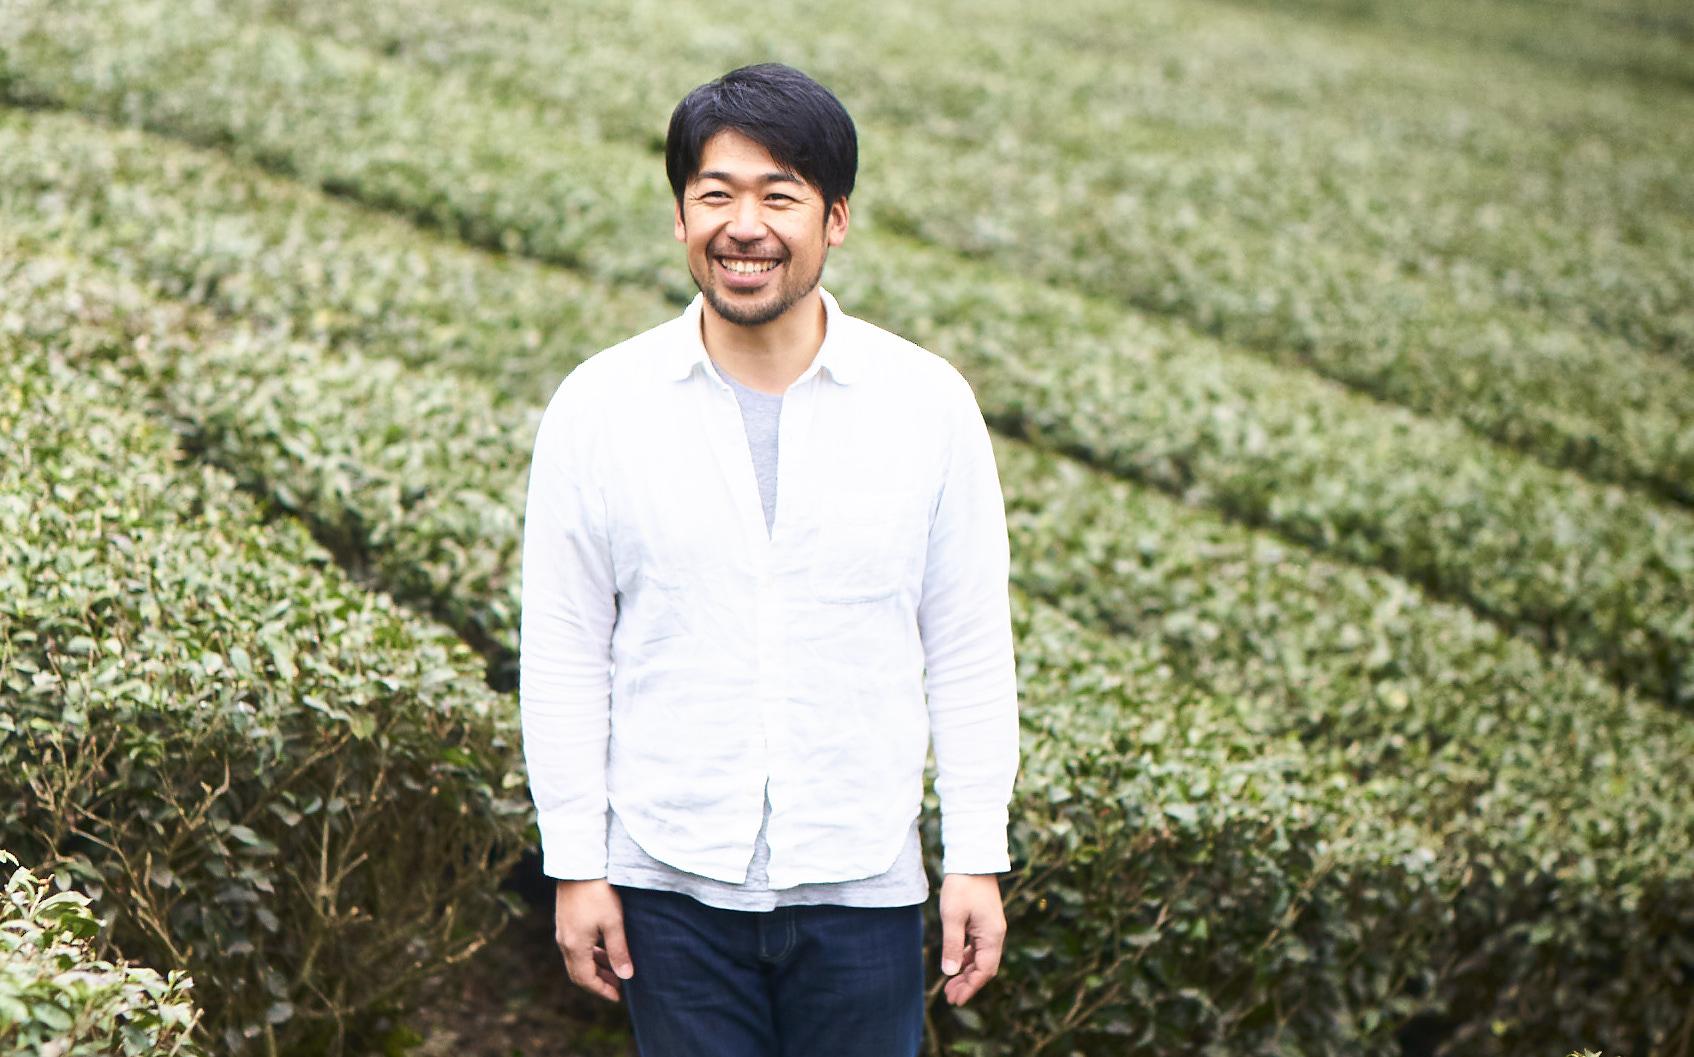 EN TEA マスターブレンダー・栽培家の松尾 俊一さん